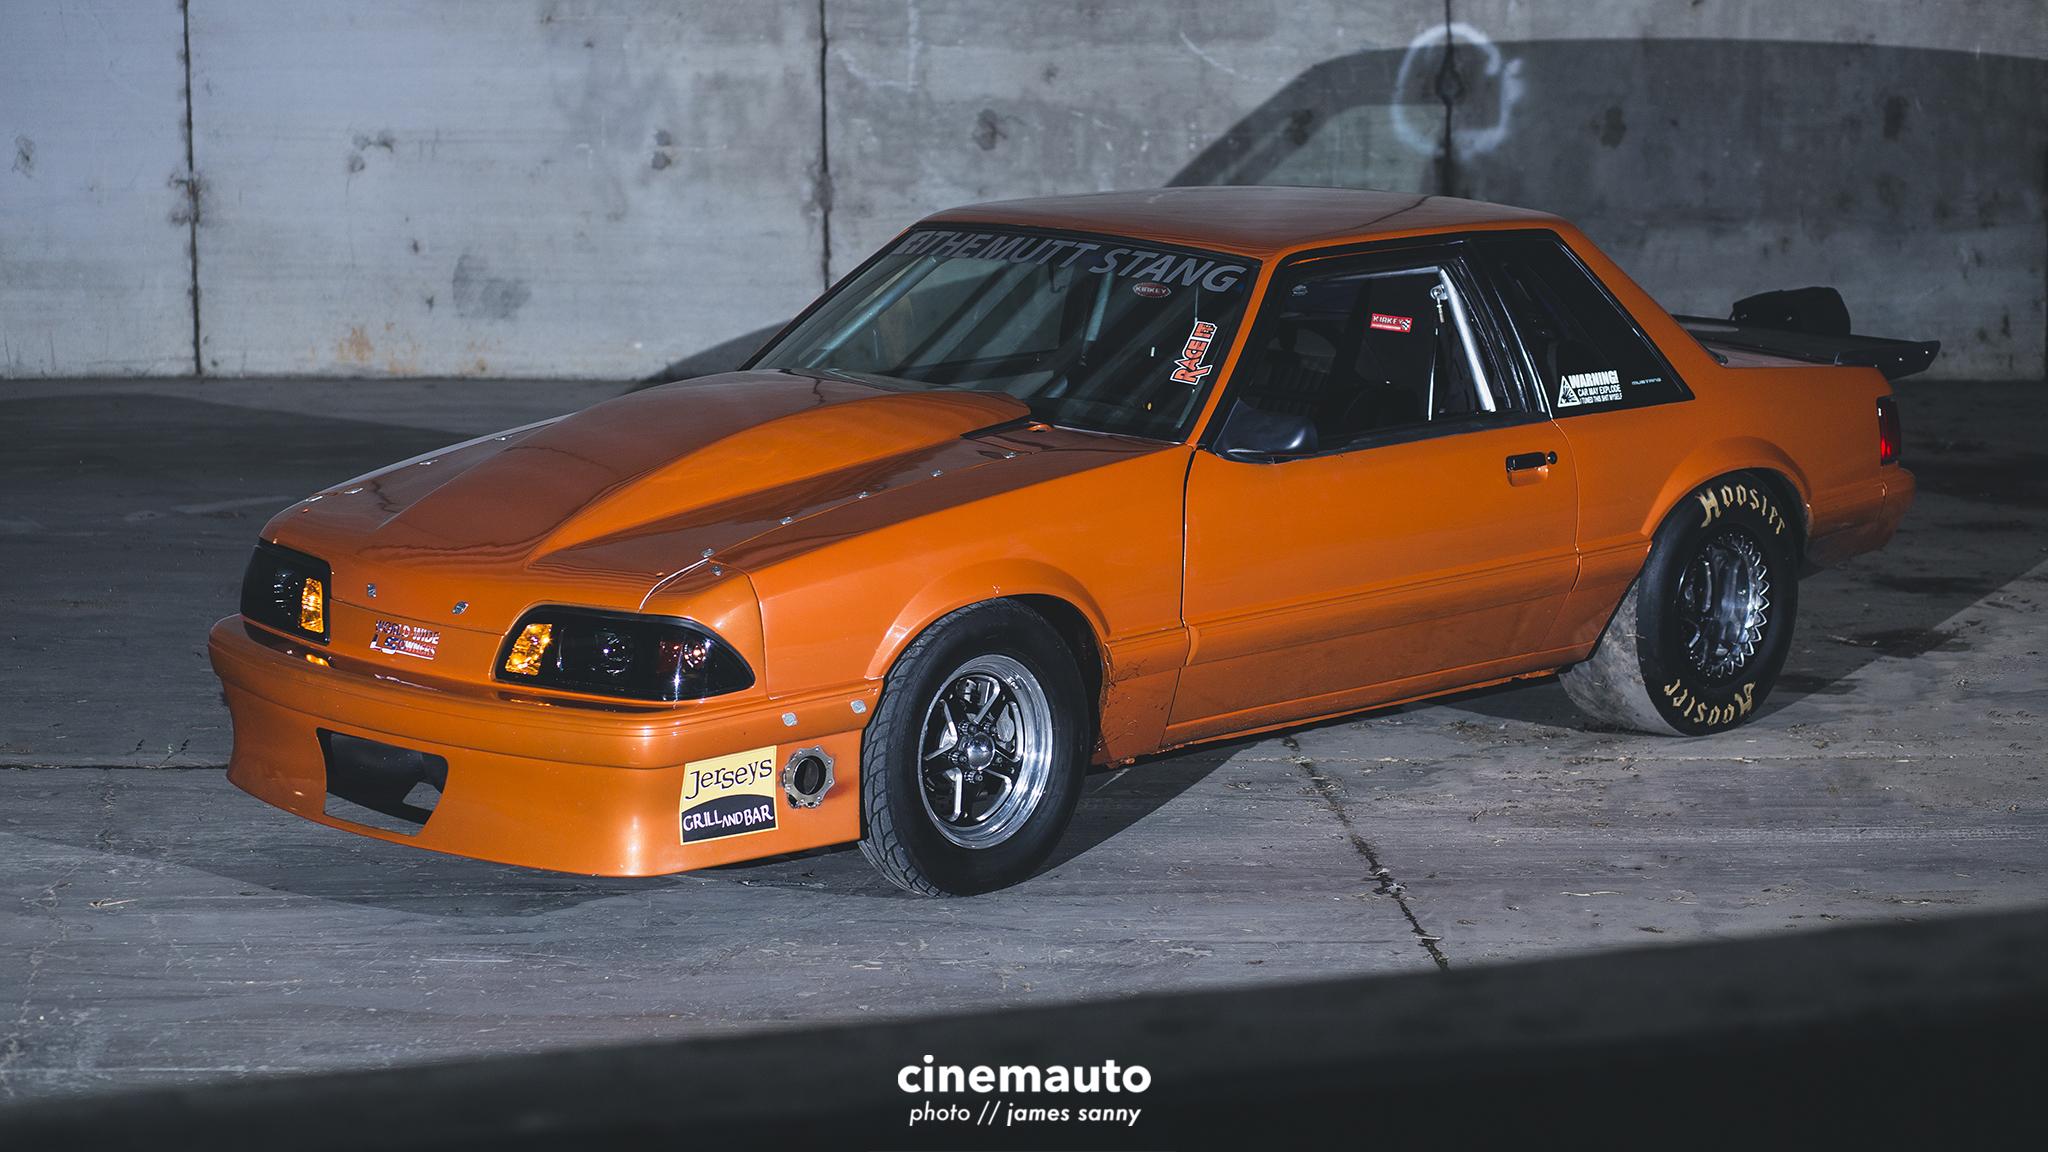 wichita-automotive-photography-kansas-racecar-3.jpg